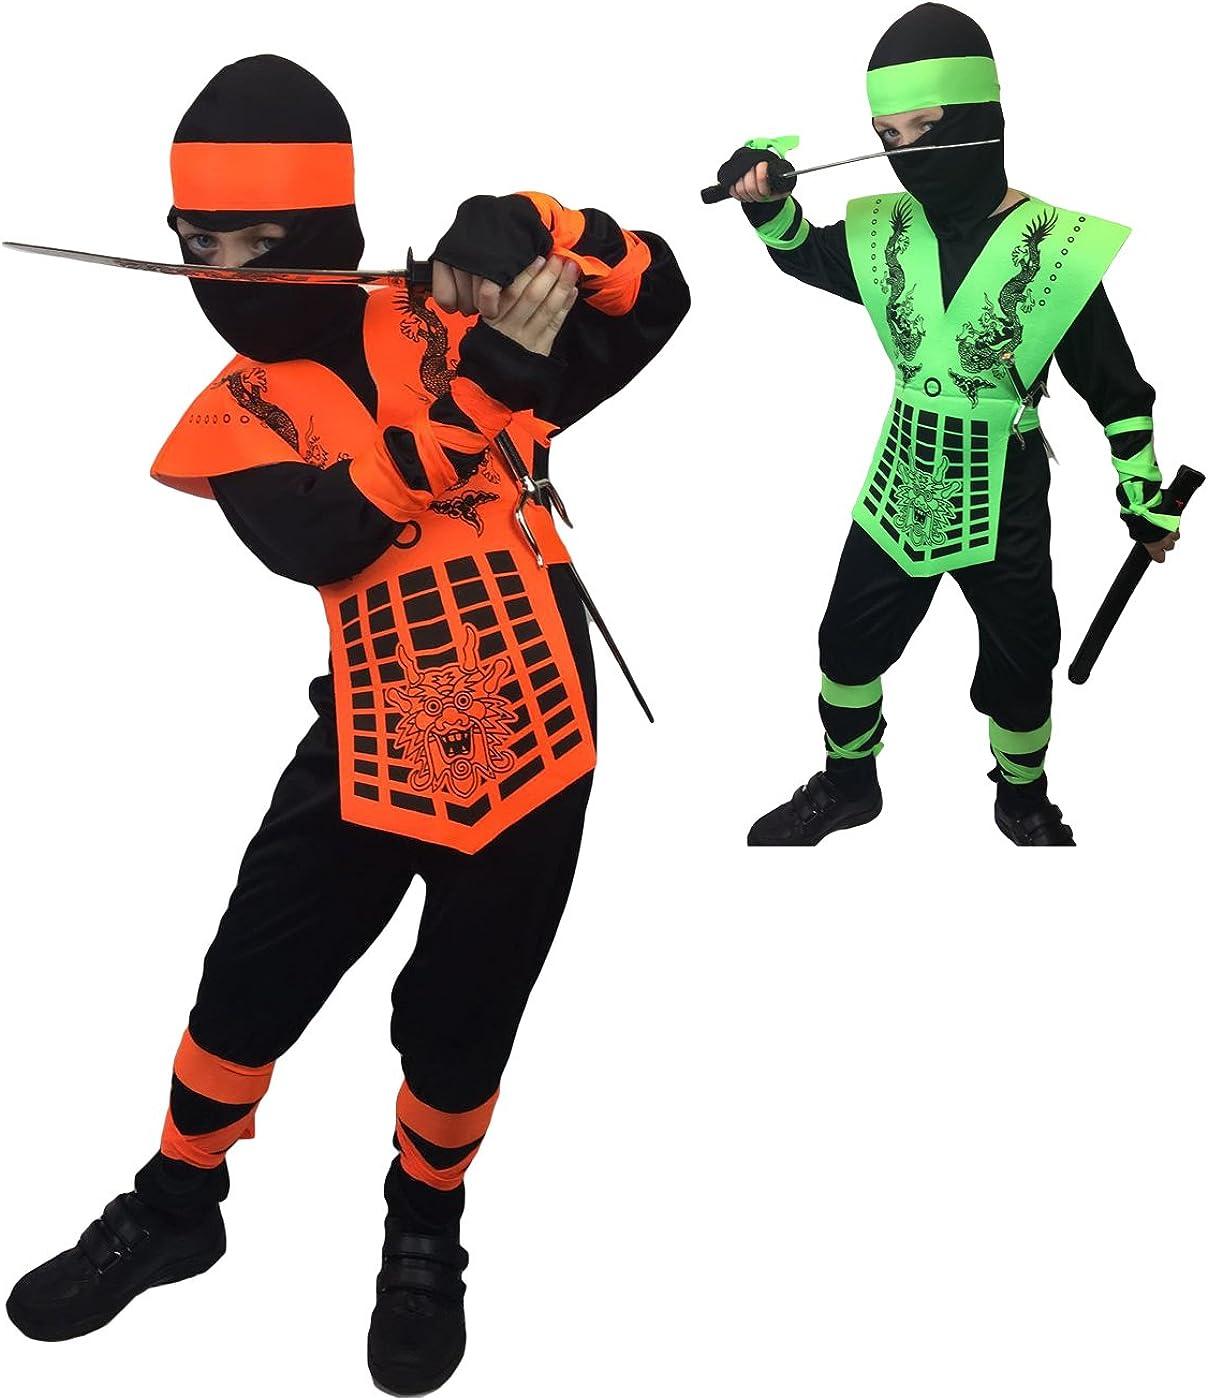 Neon Ninja Disfraces, Gomas Johnnies, niños, 3 tamaños, Naranja y Verde